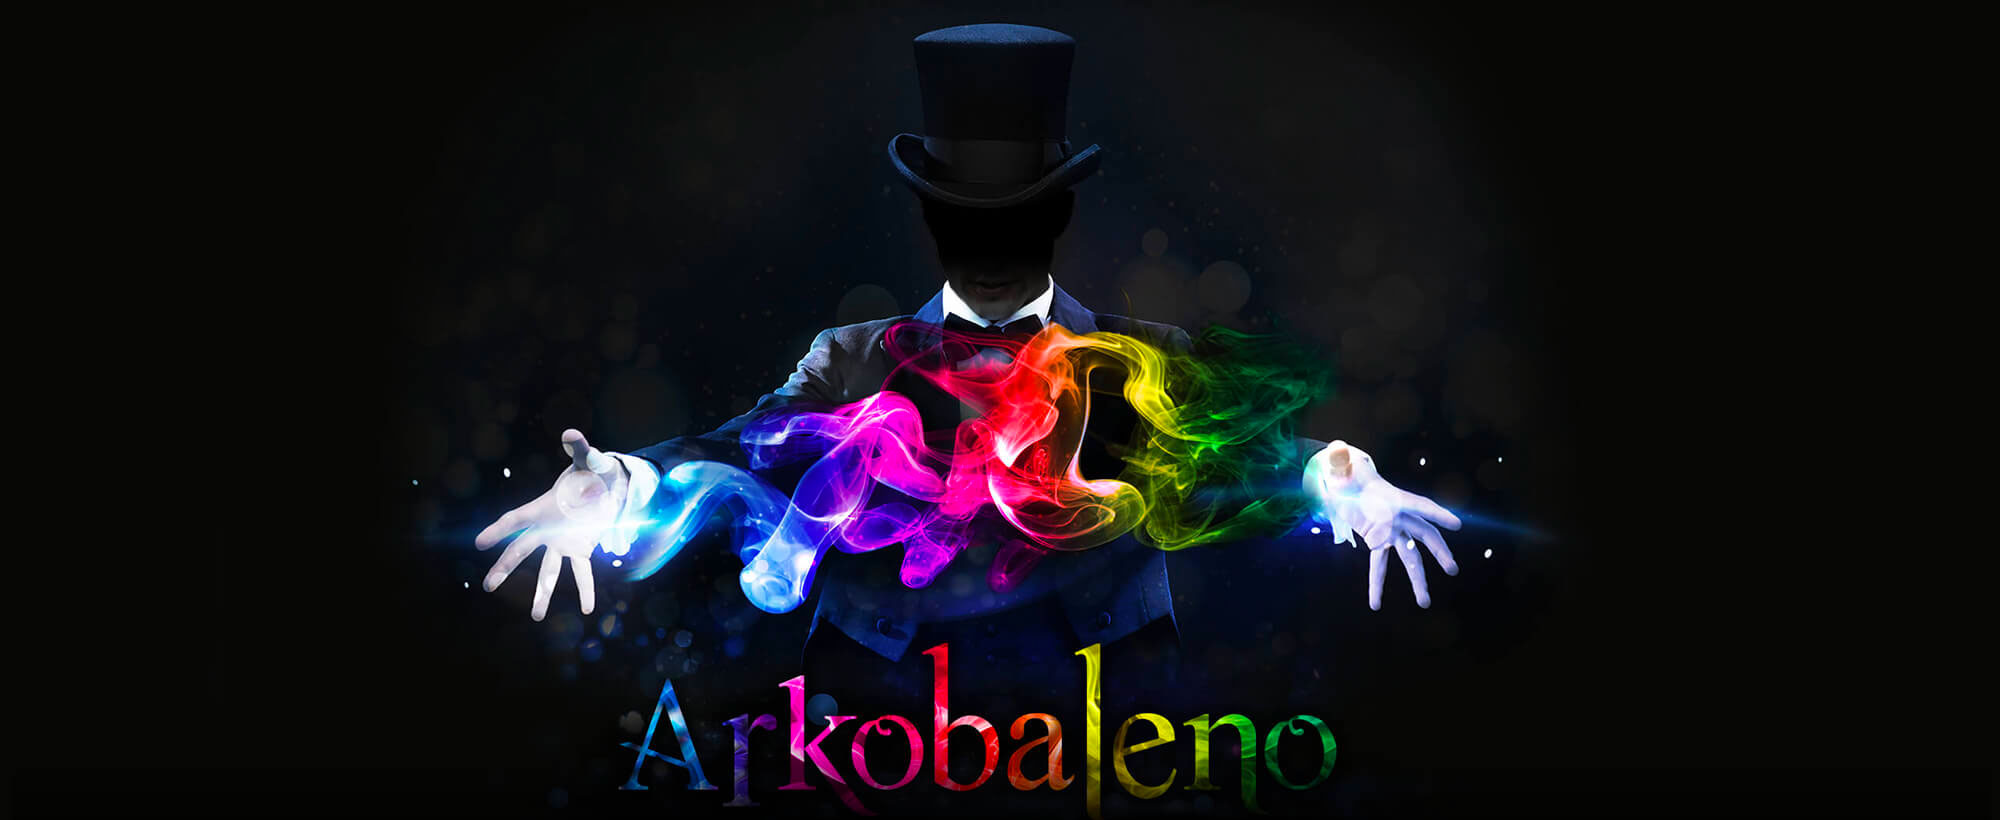 fullwidth-logo-arkobaleno